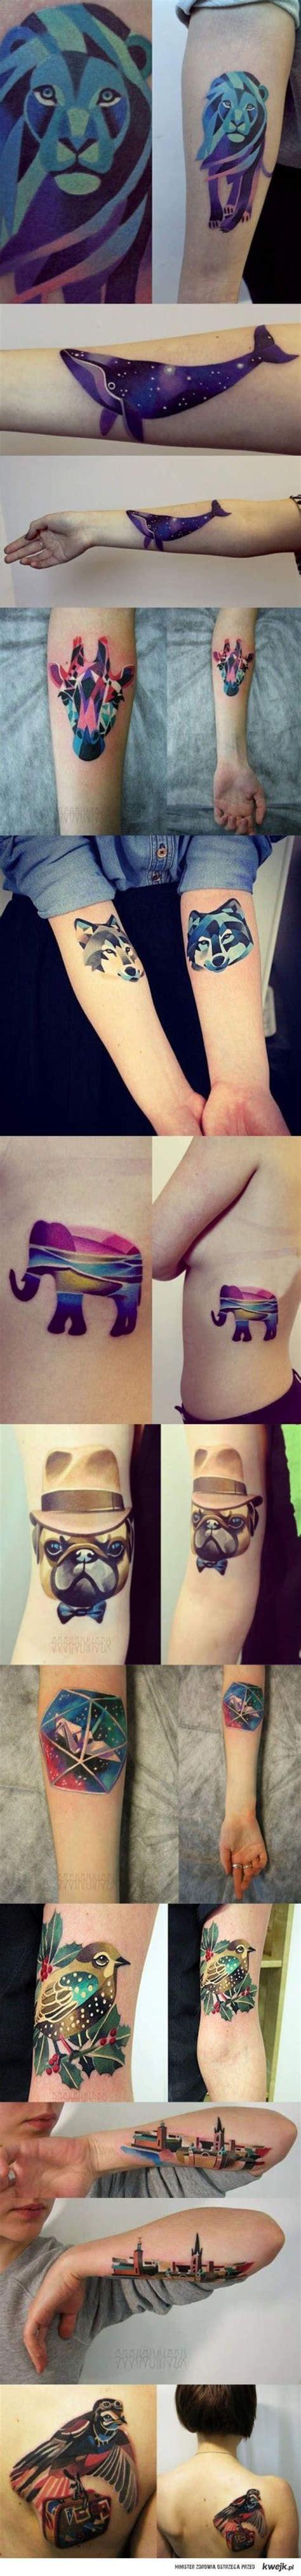 geometric tattoo artist instagram really cool geometric tattoos artist sasha unisex